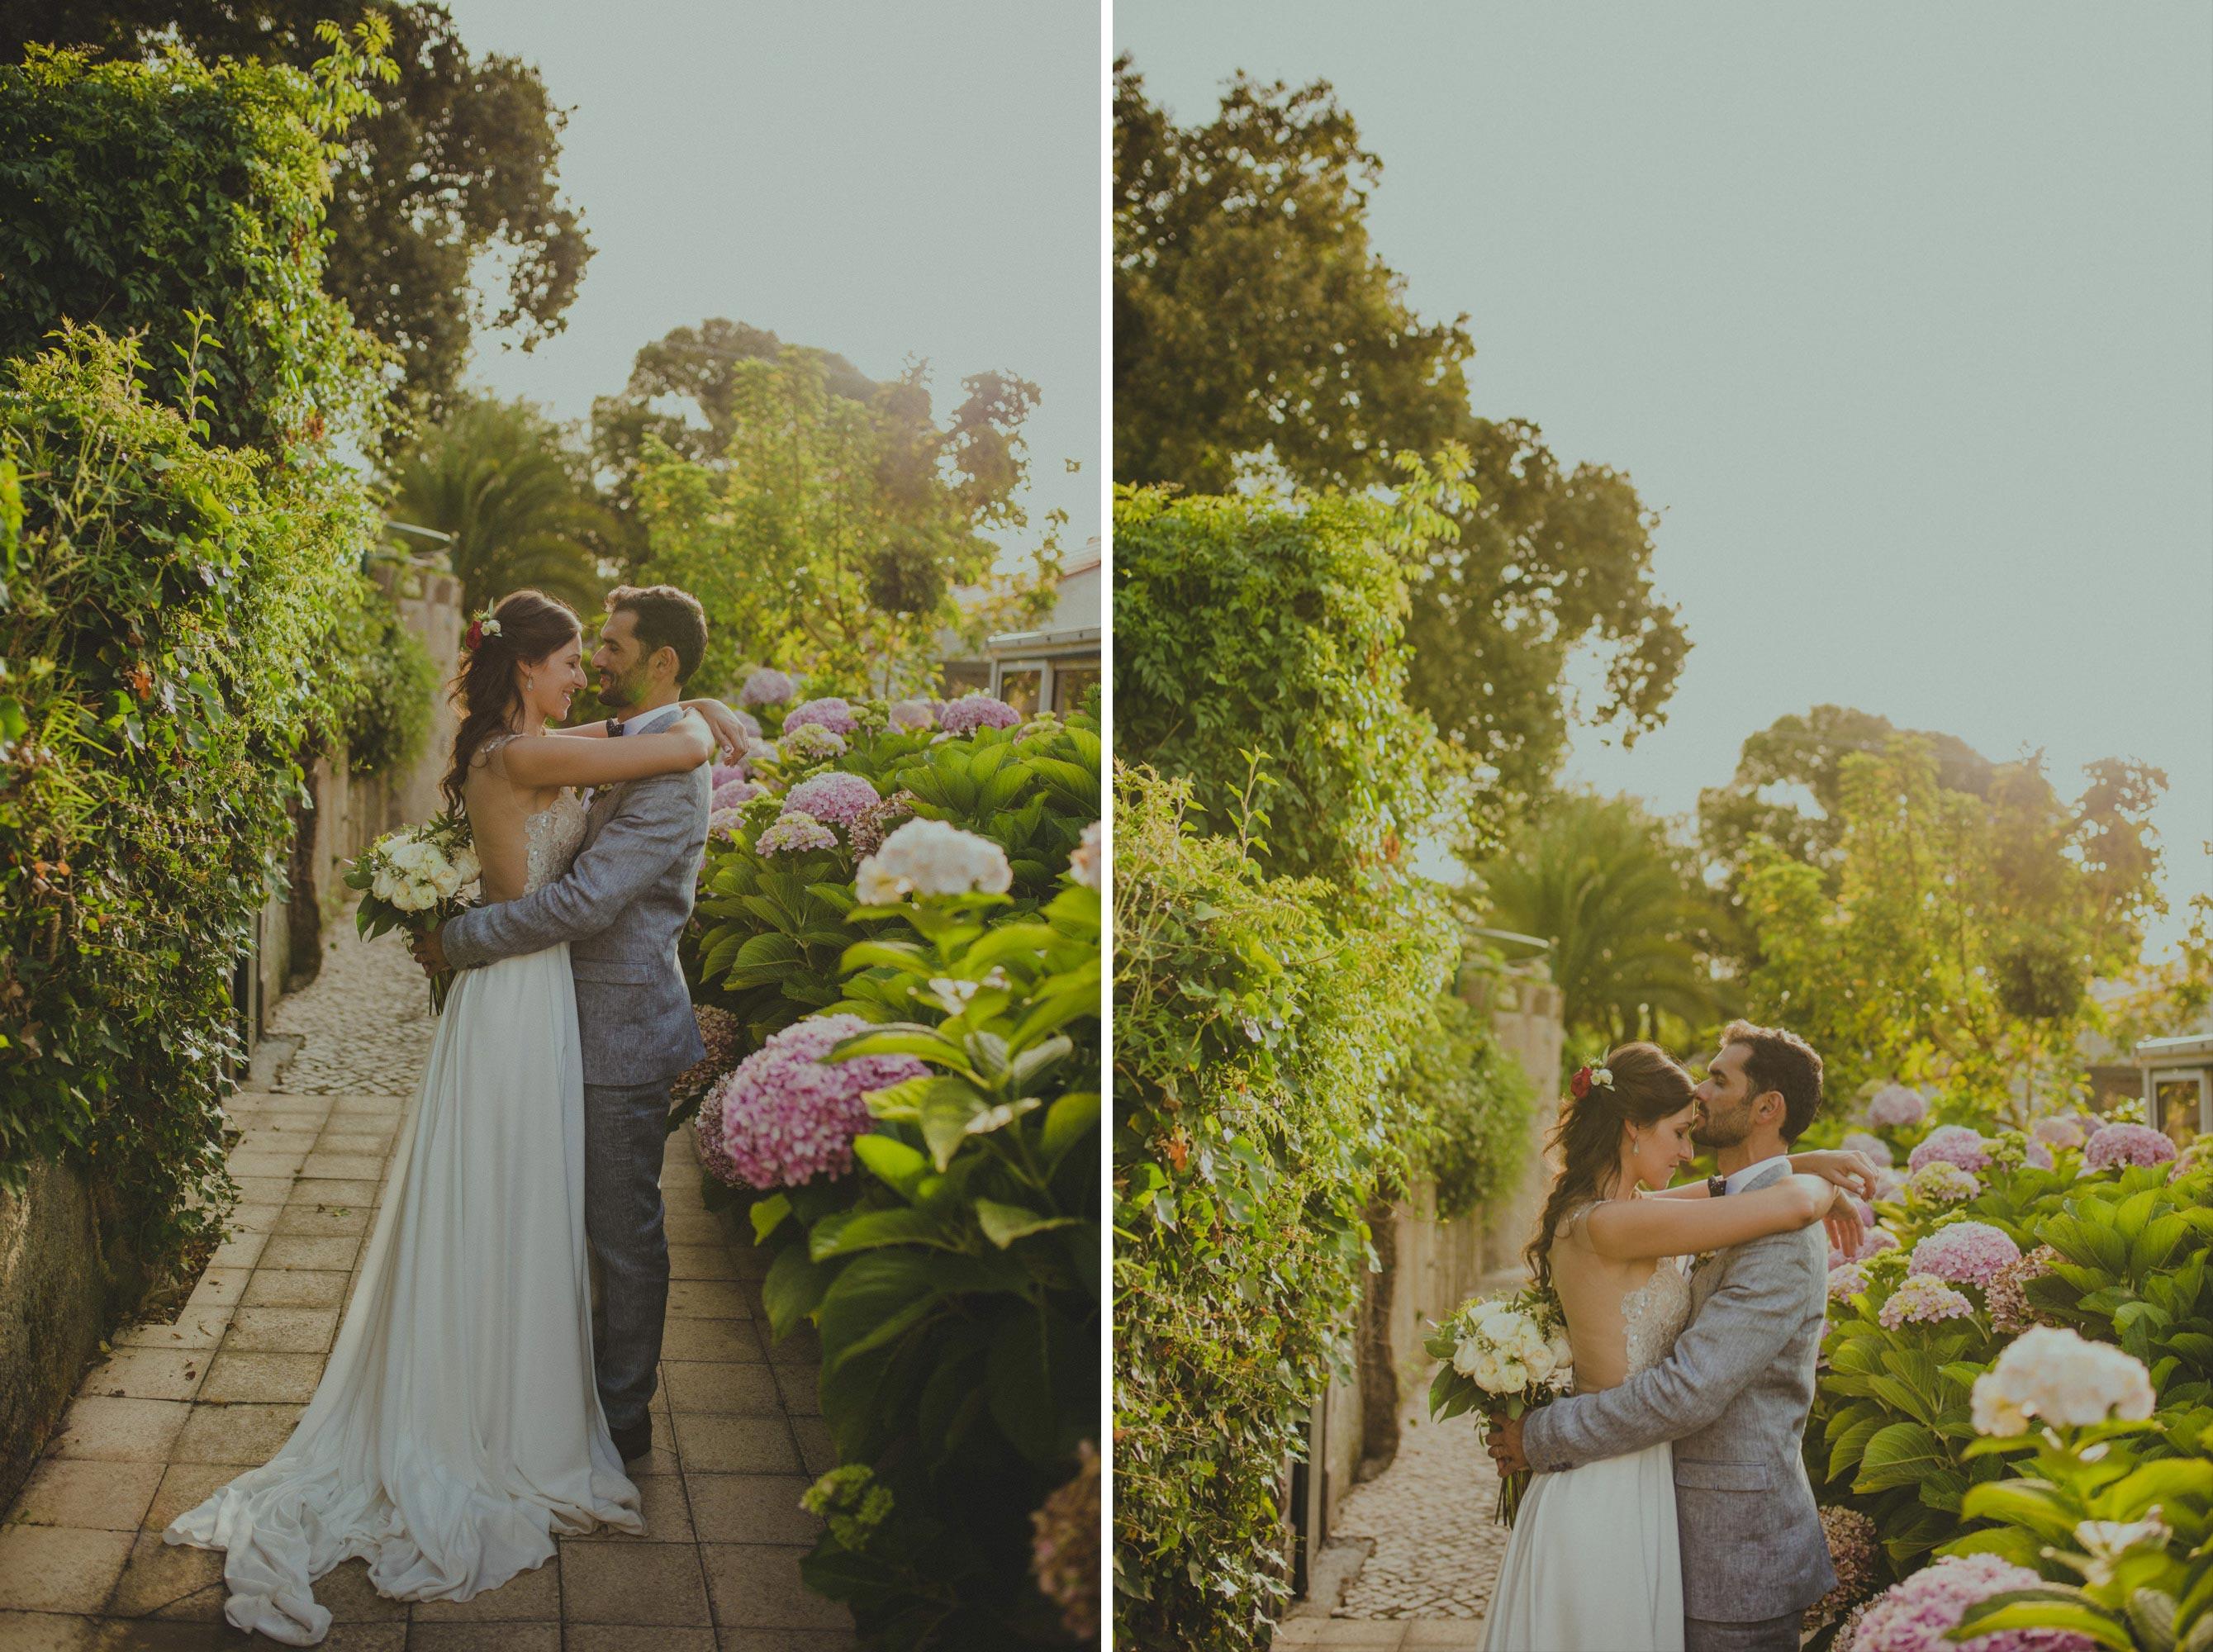 038-carina-e-samuel-wedding-casamento-quinta-dos-rouxinois-rustico-my-fancy-wedding-mafra-malveira-lisboa-sintra-cascais-filipe-santiago-fotografia-fotografo-lifestyle-destination-portugal